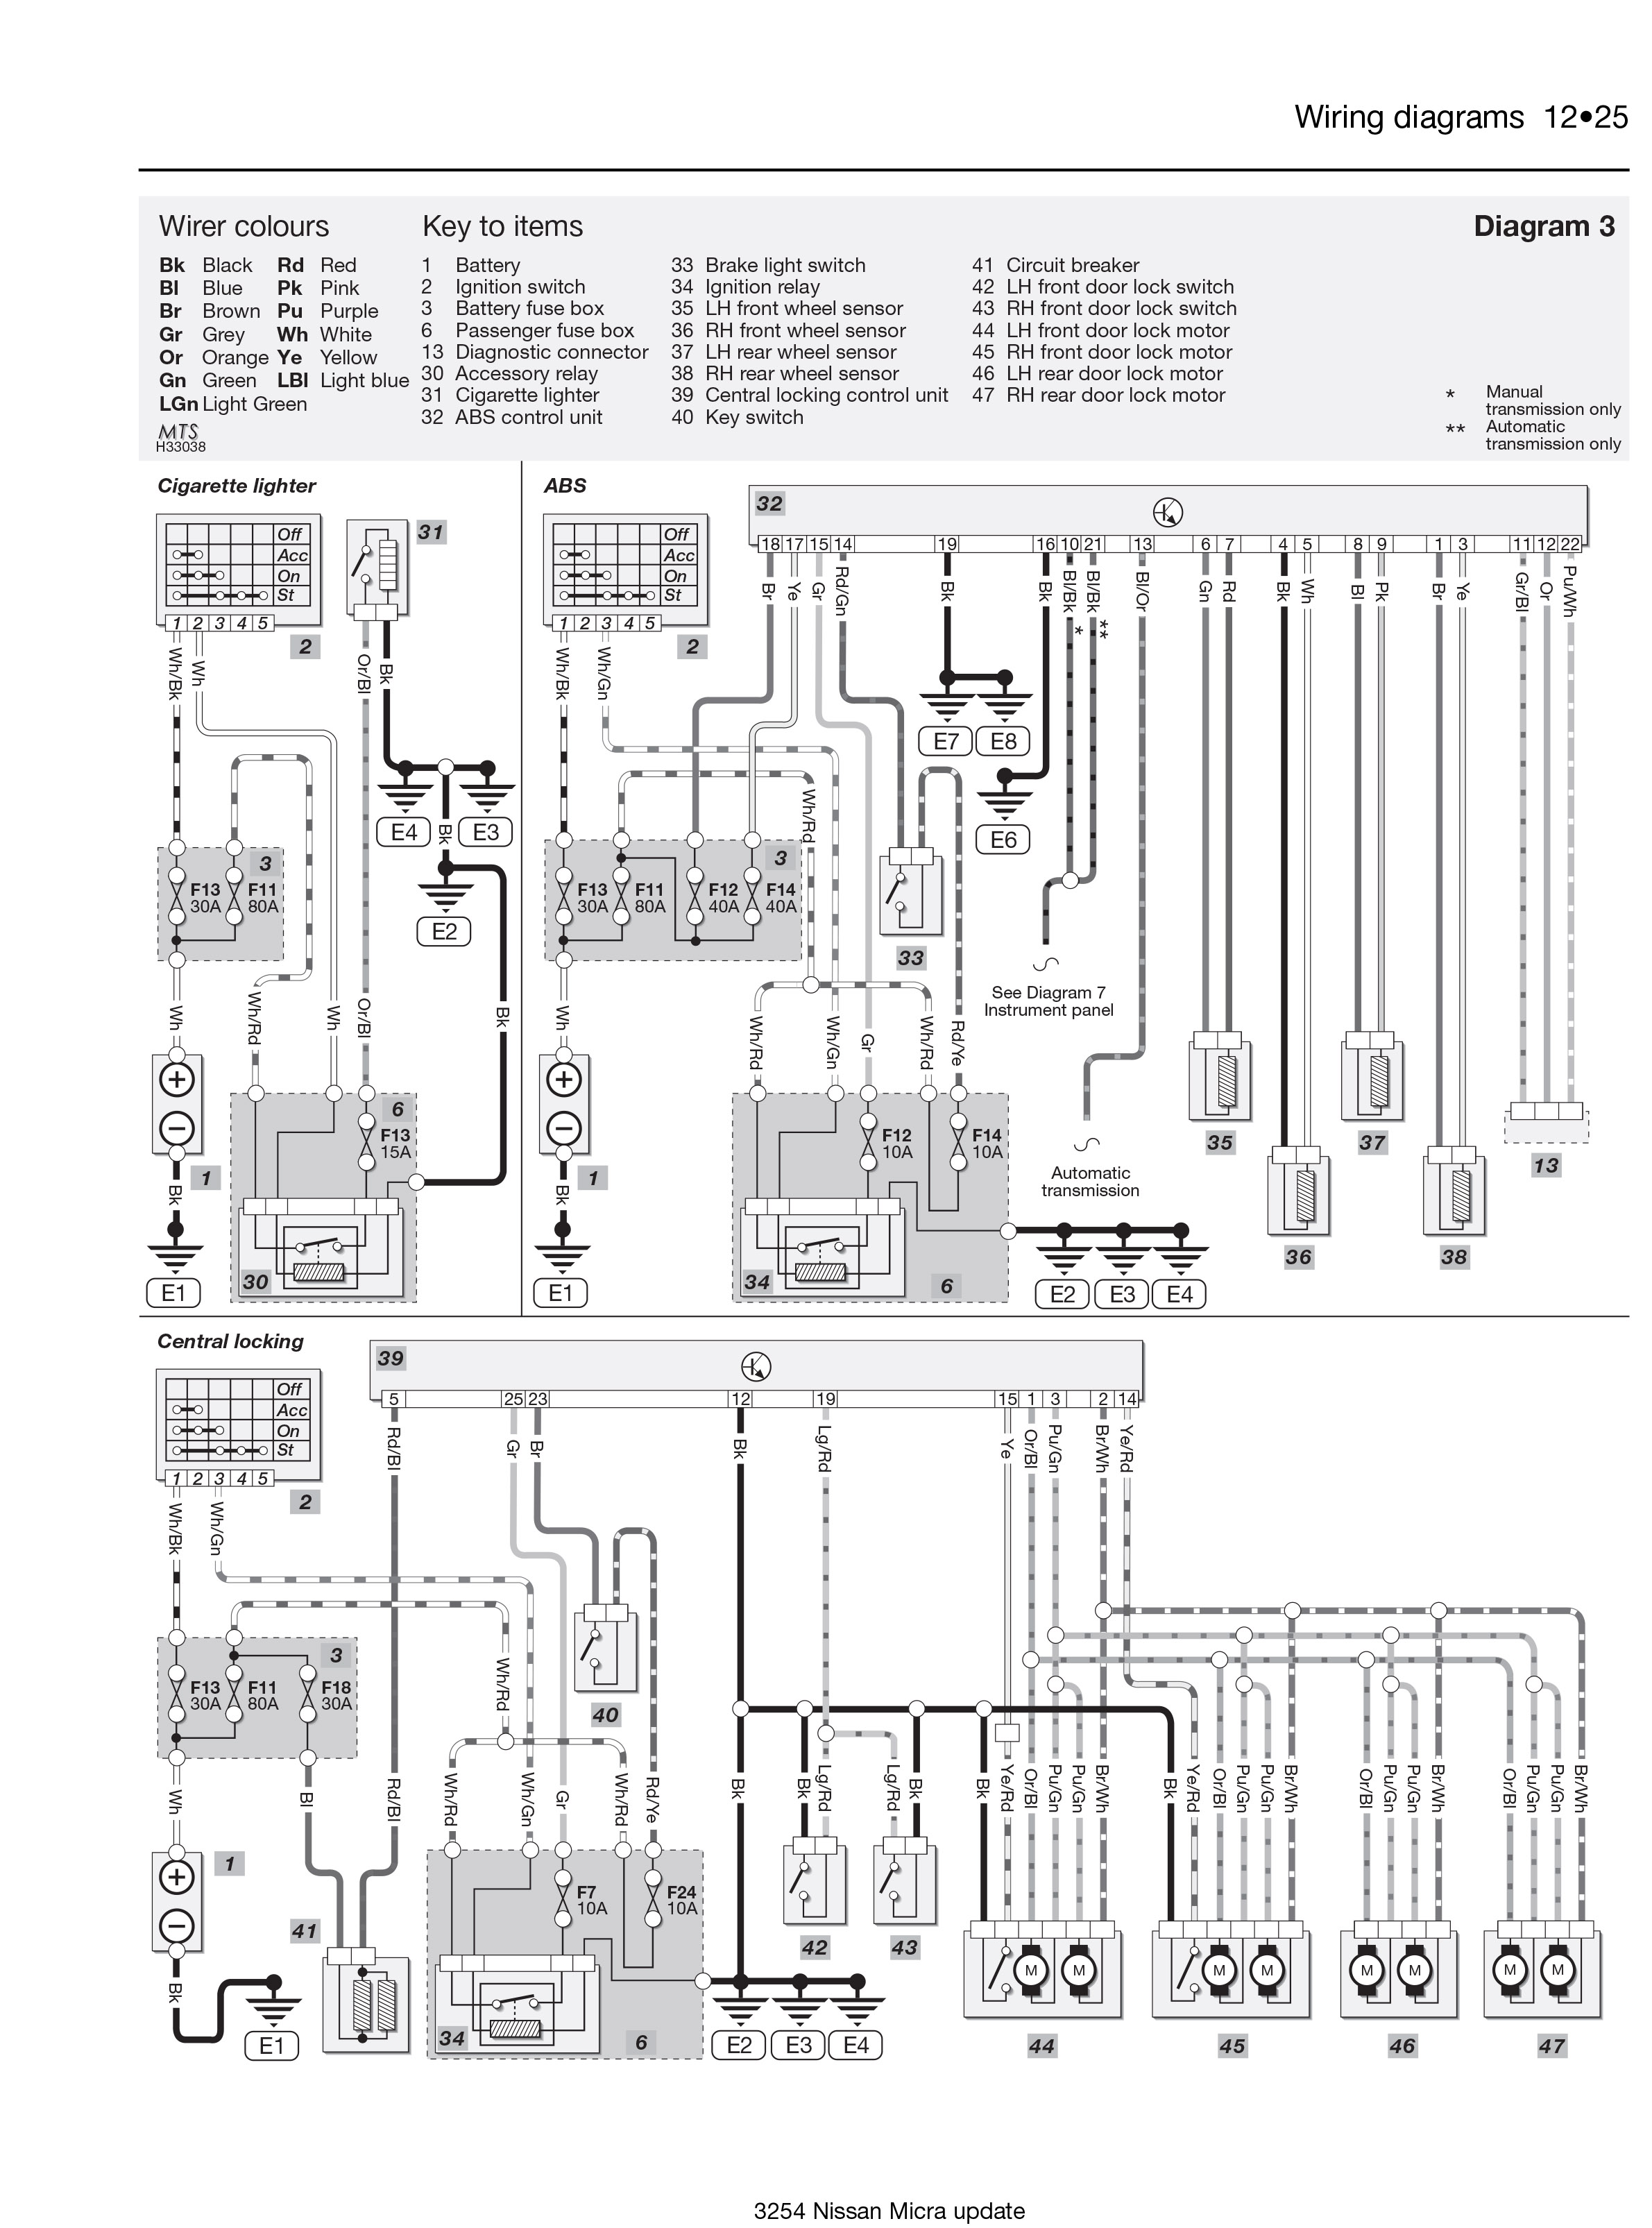 Nett Nissan Micra Schaltplan Fotos - Schaltplan Serie Circuit ...